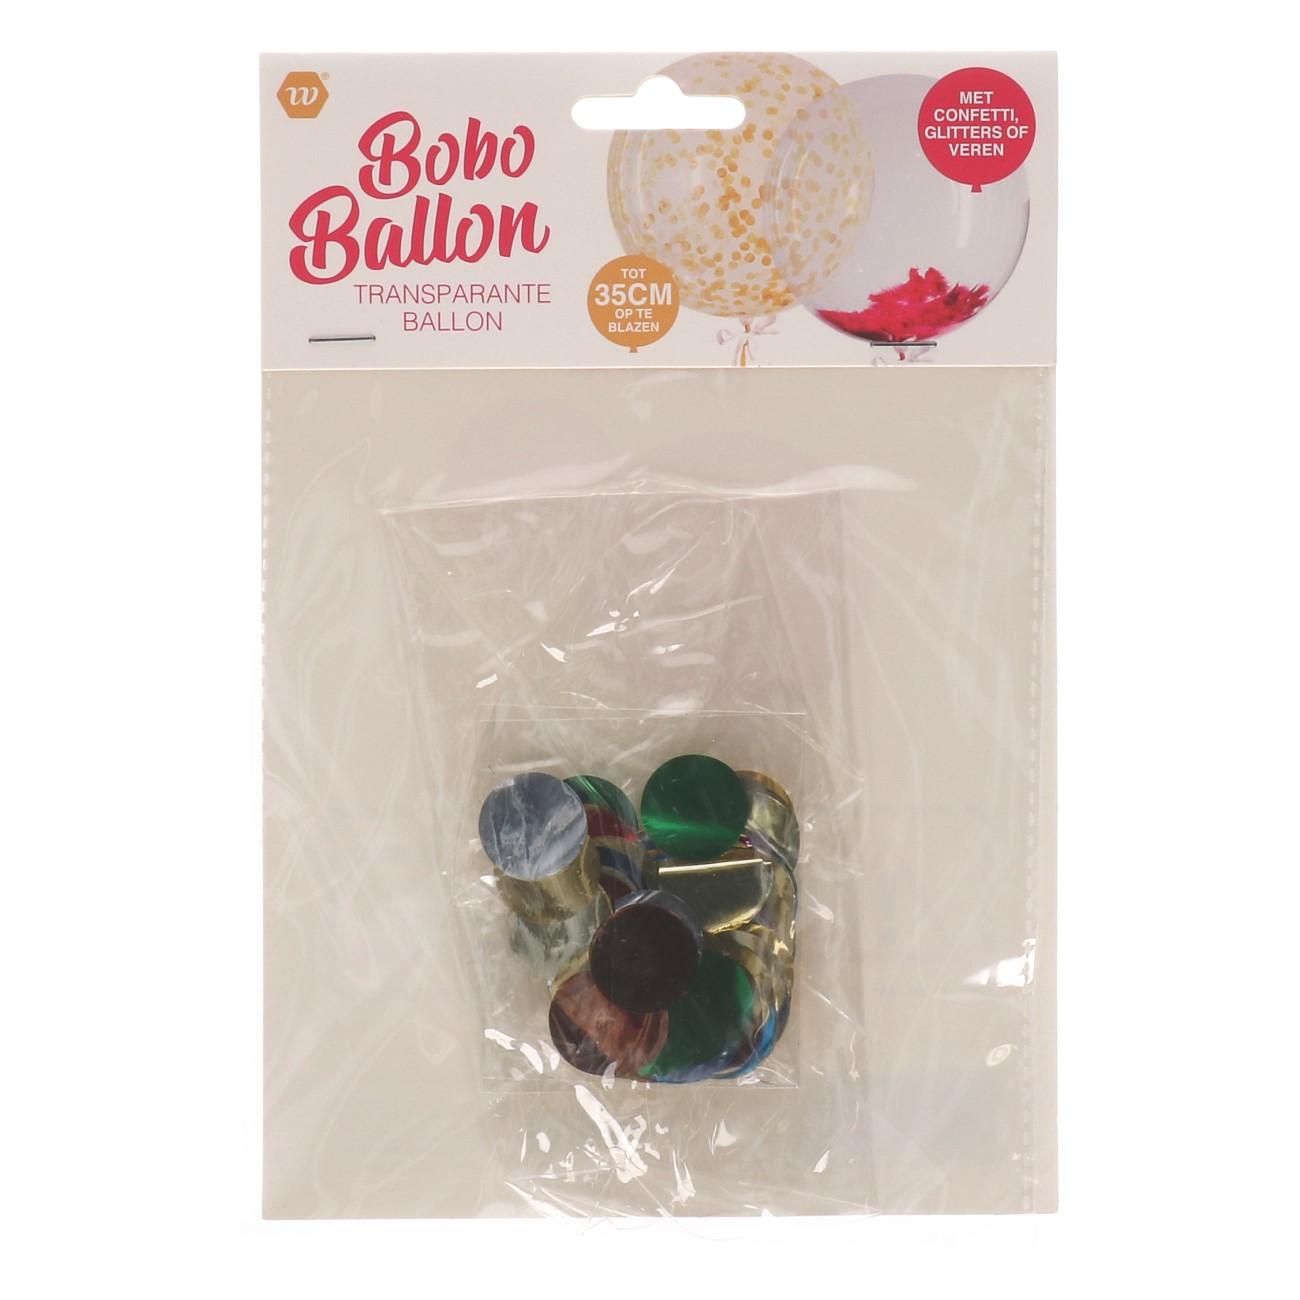 Bobo ballon met confetti glitters of veren